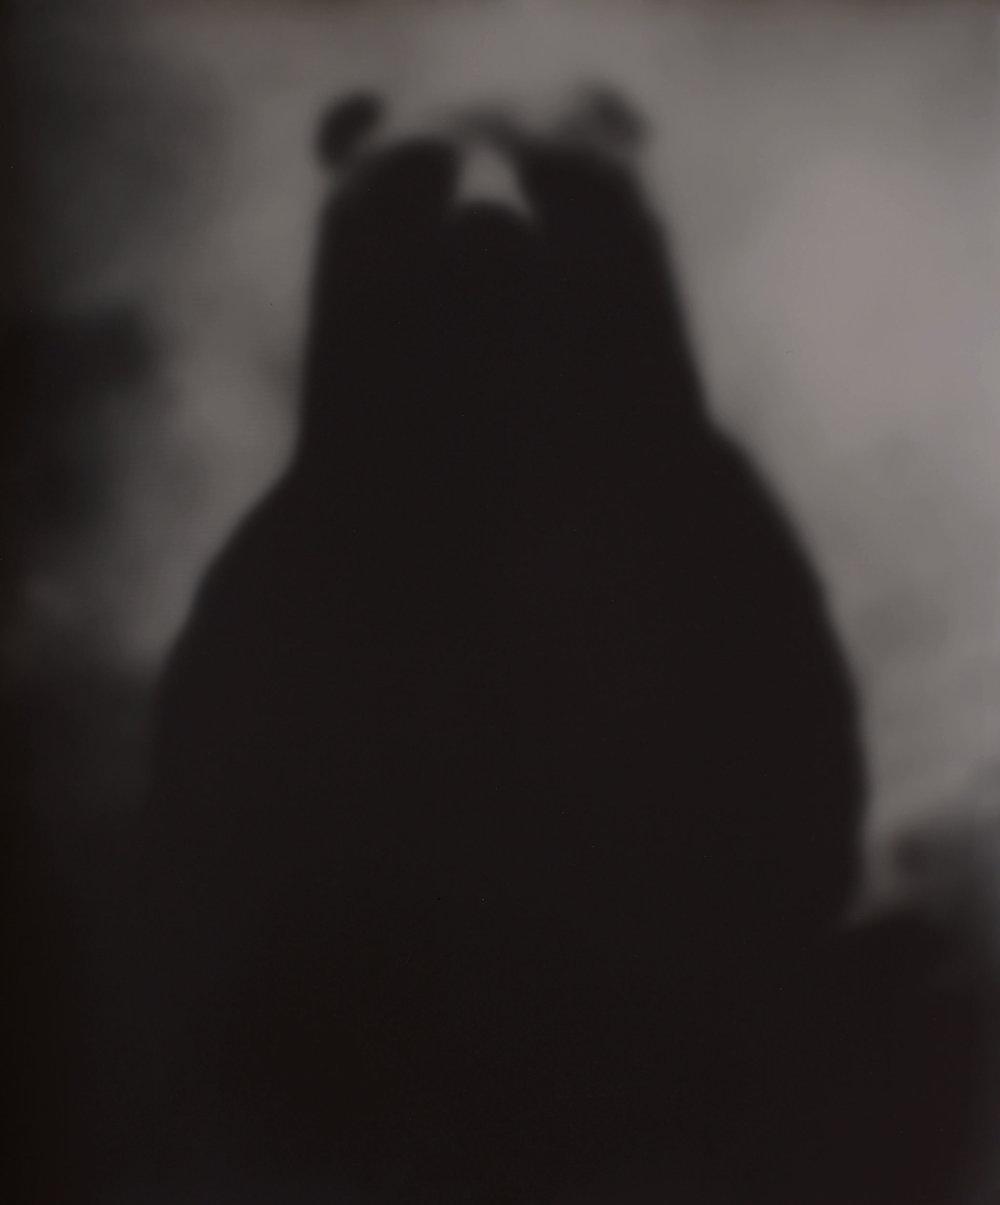 Bear, 1996 Gelatin Silver Print, 24 x 20 in.